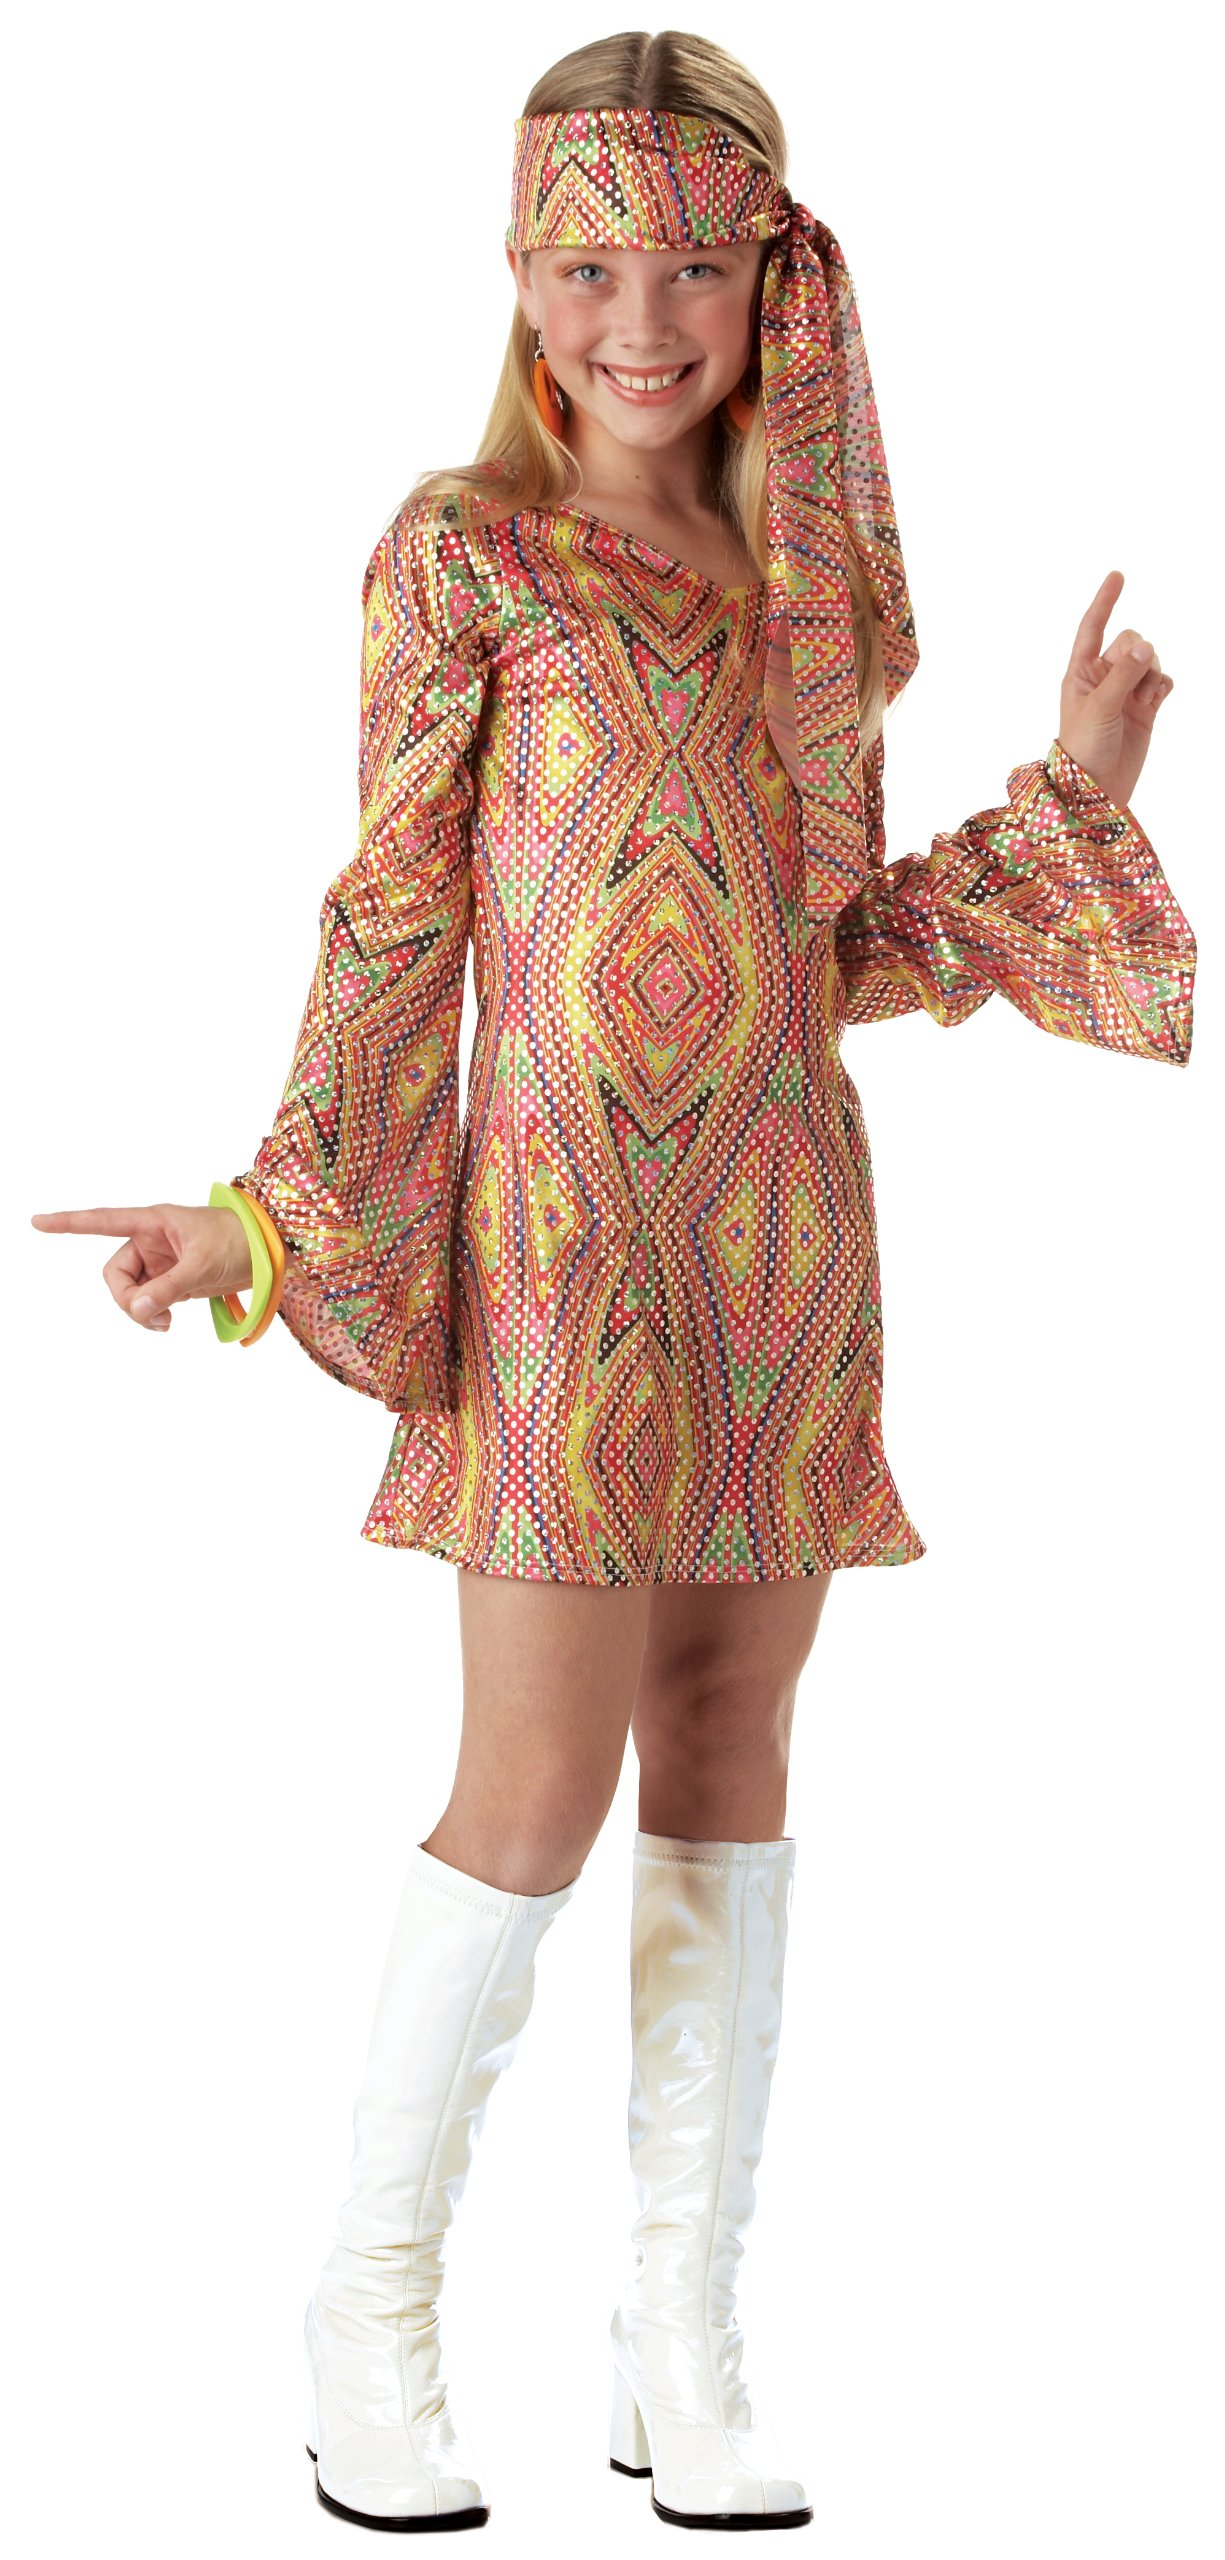 California Costumes Toys Disco Dolly, Medium